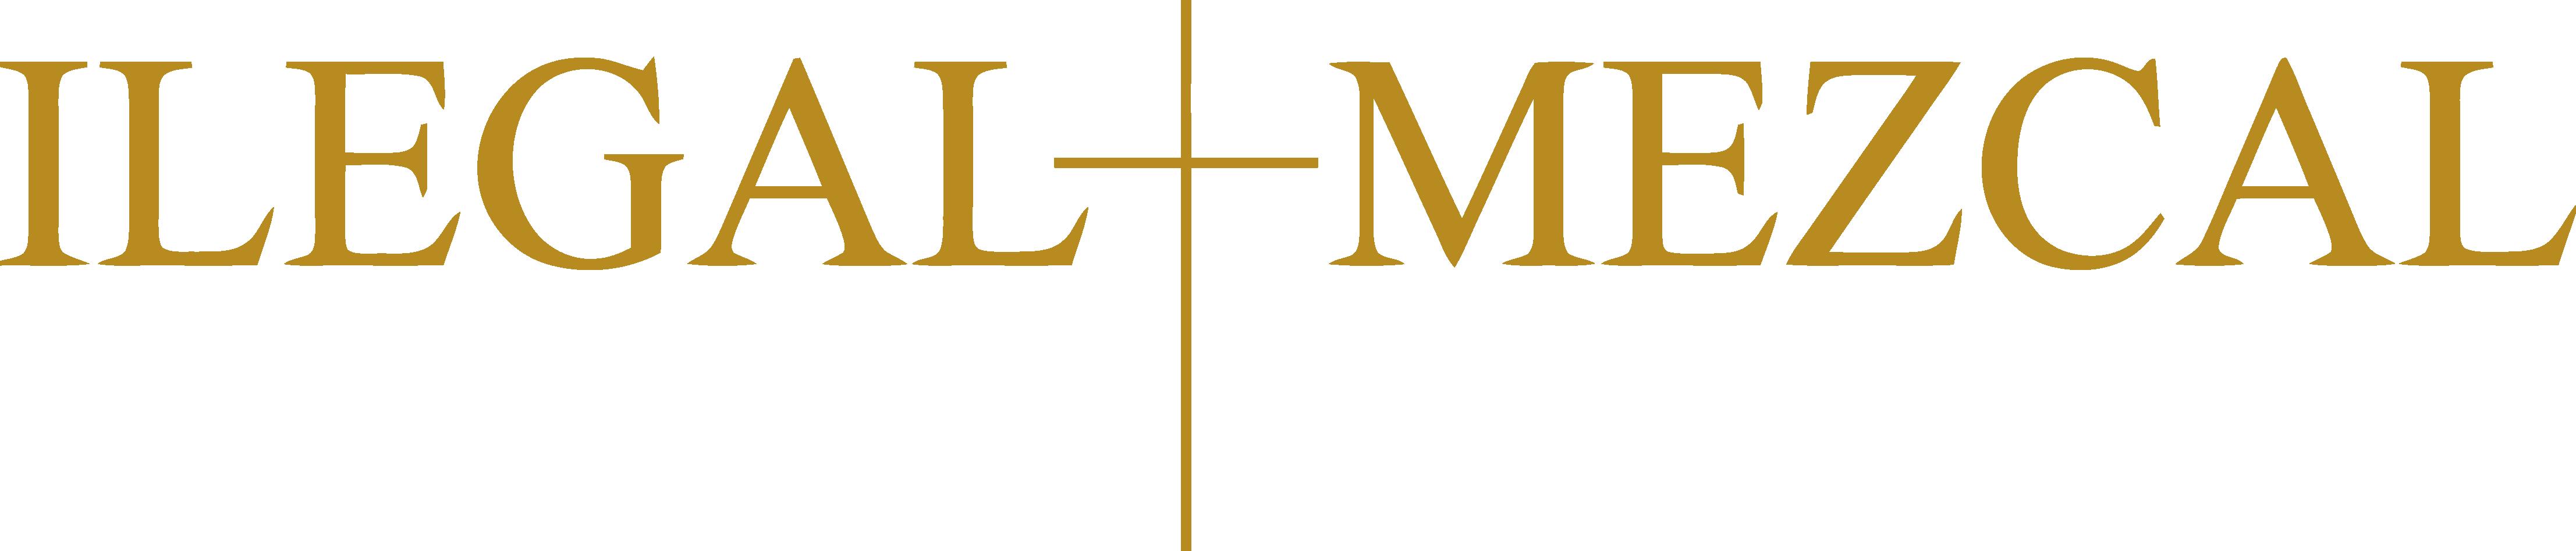 Illegal Mezcal Logo